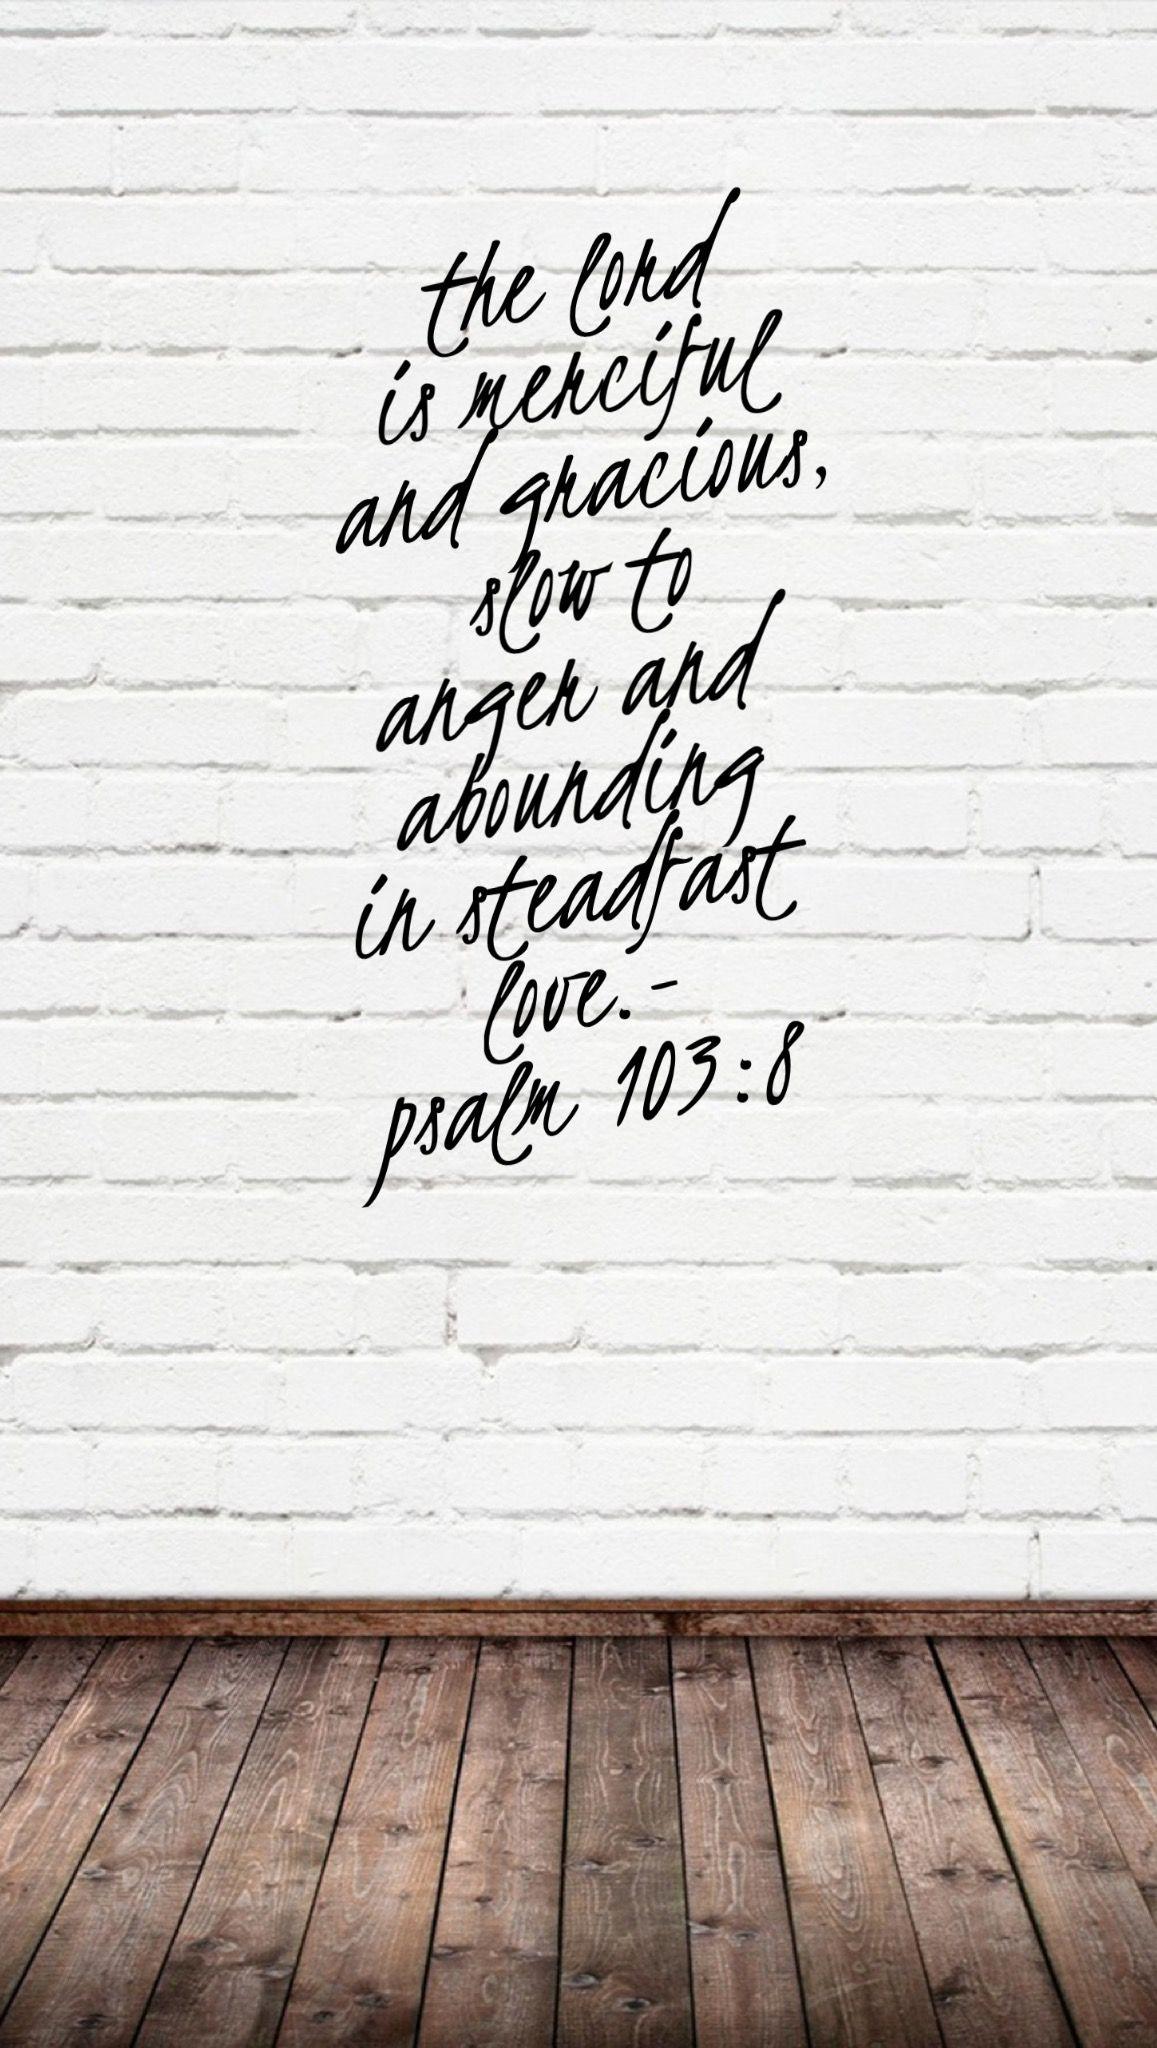 Psalm 1038 steadfastlove thatsmyGod iphone wallpaper